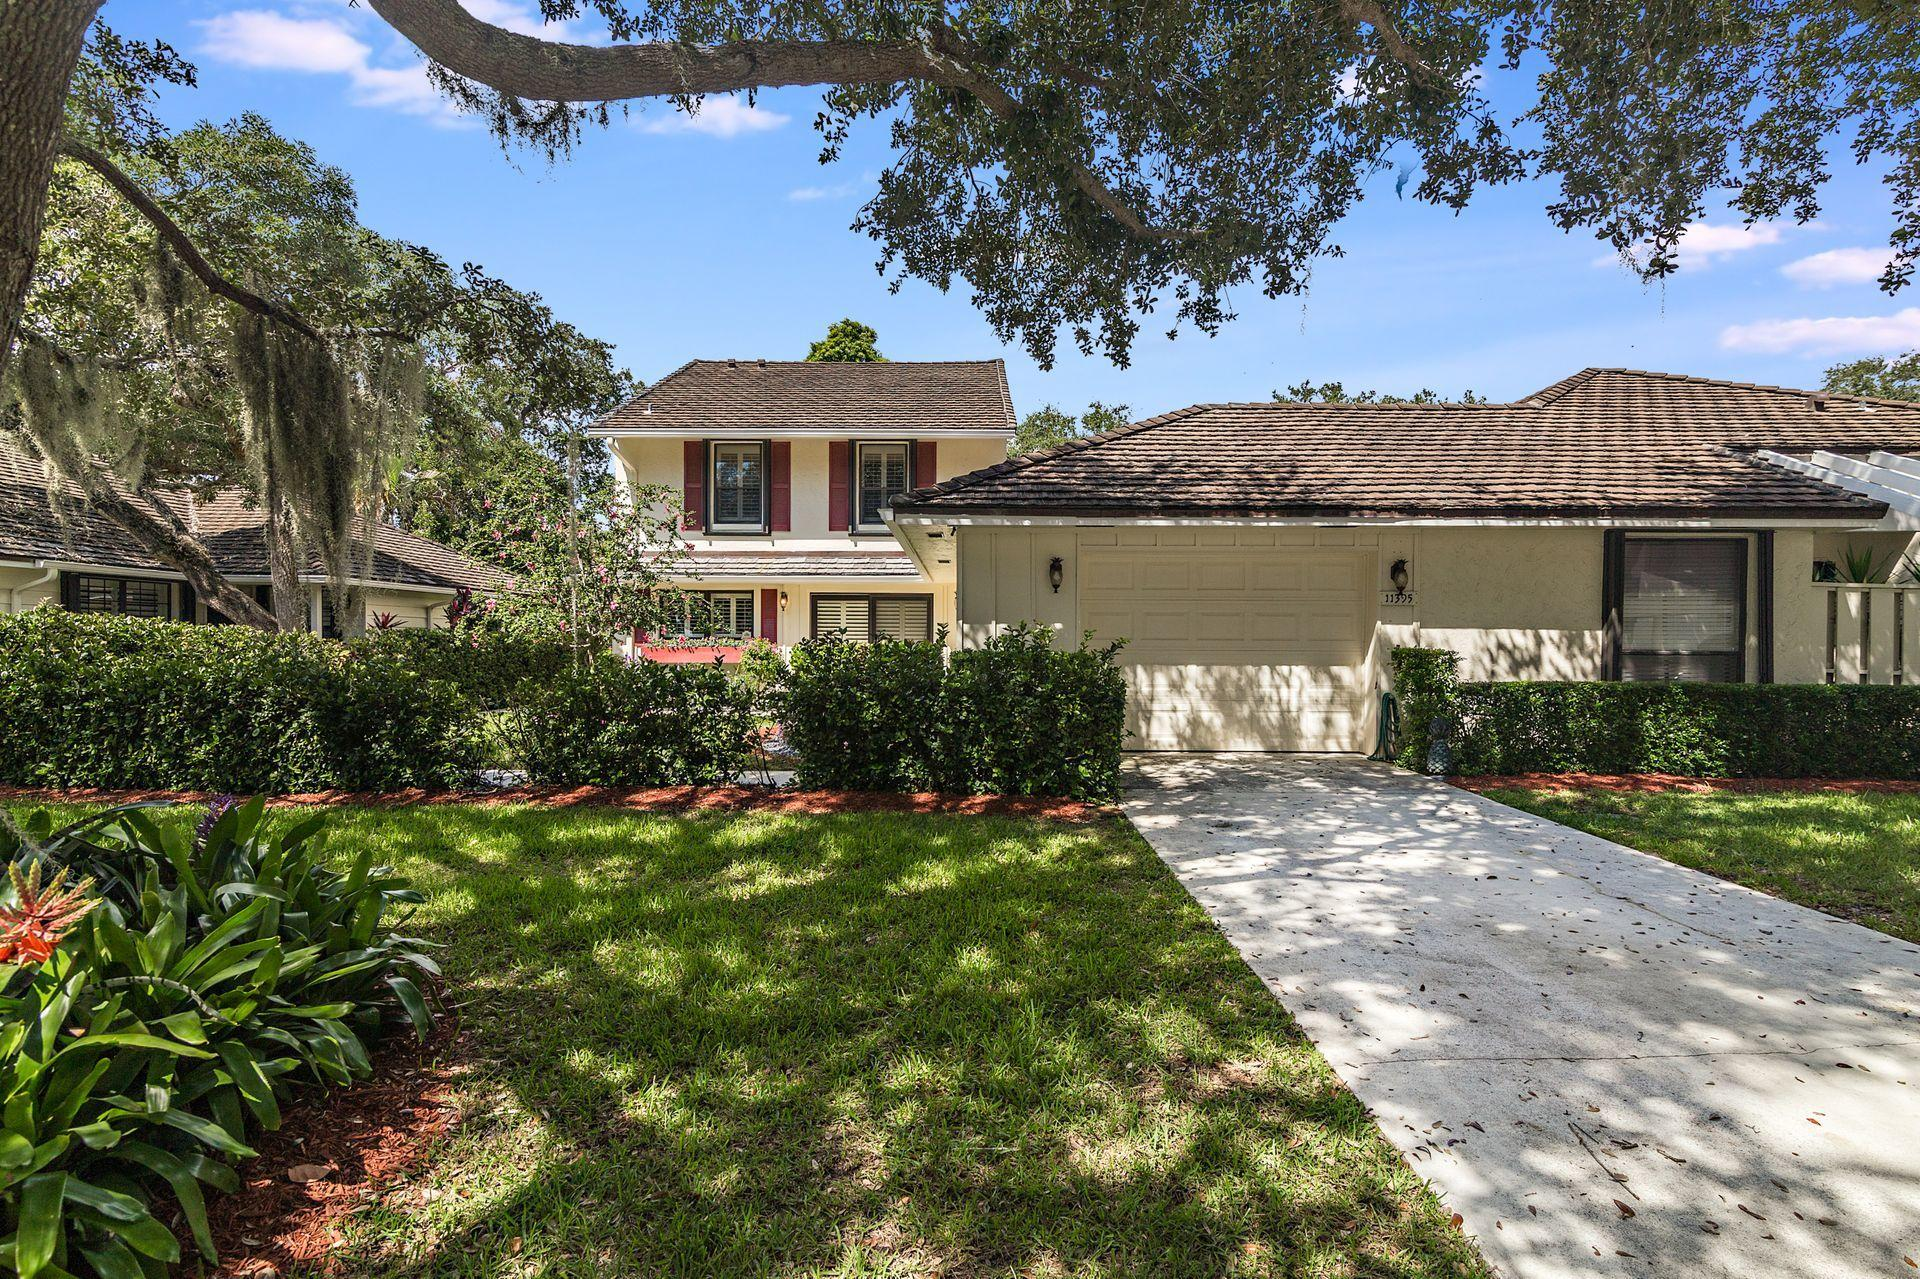 11395 Twelve Oaks, North Palm Beach, Florida 33408